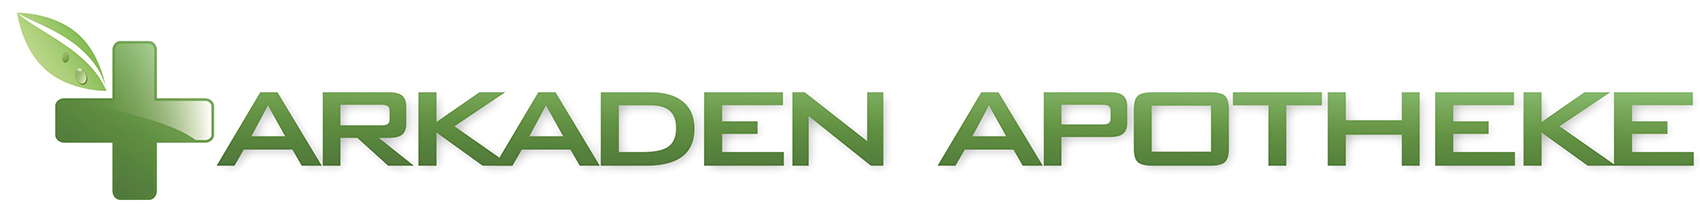 Logo der Arkaden Apotheke